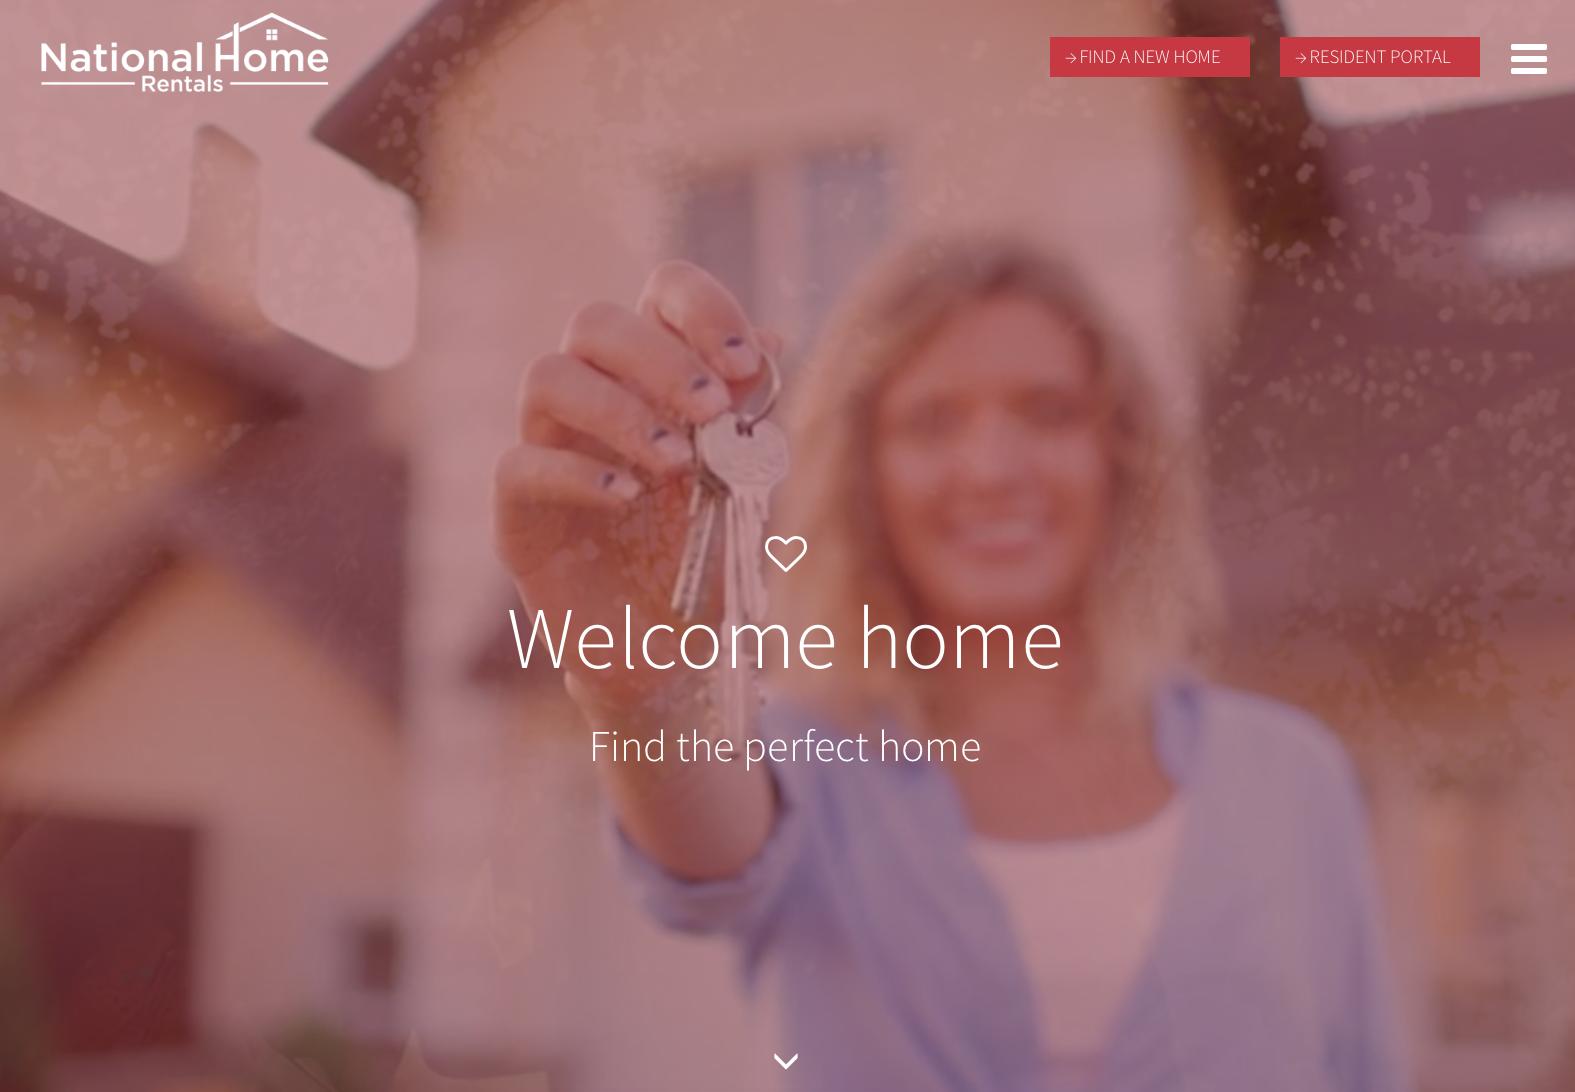 responsive website design for National Home Rentals